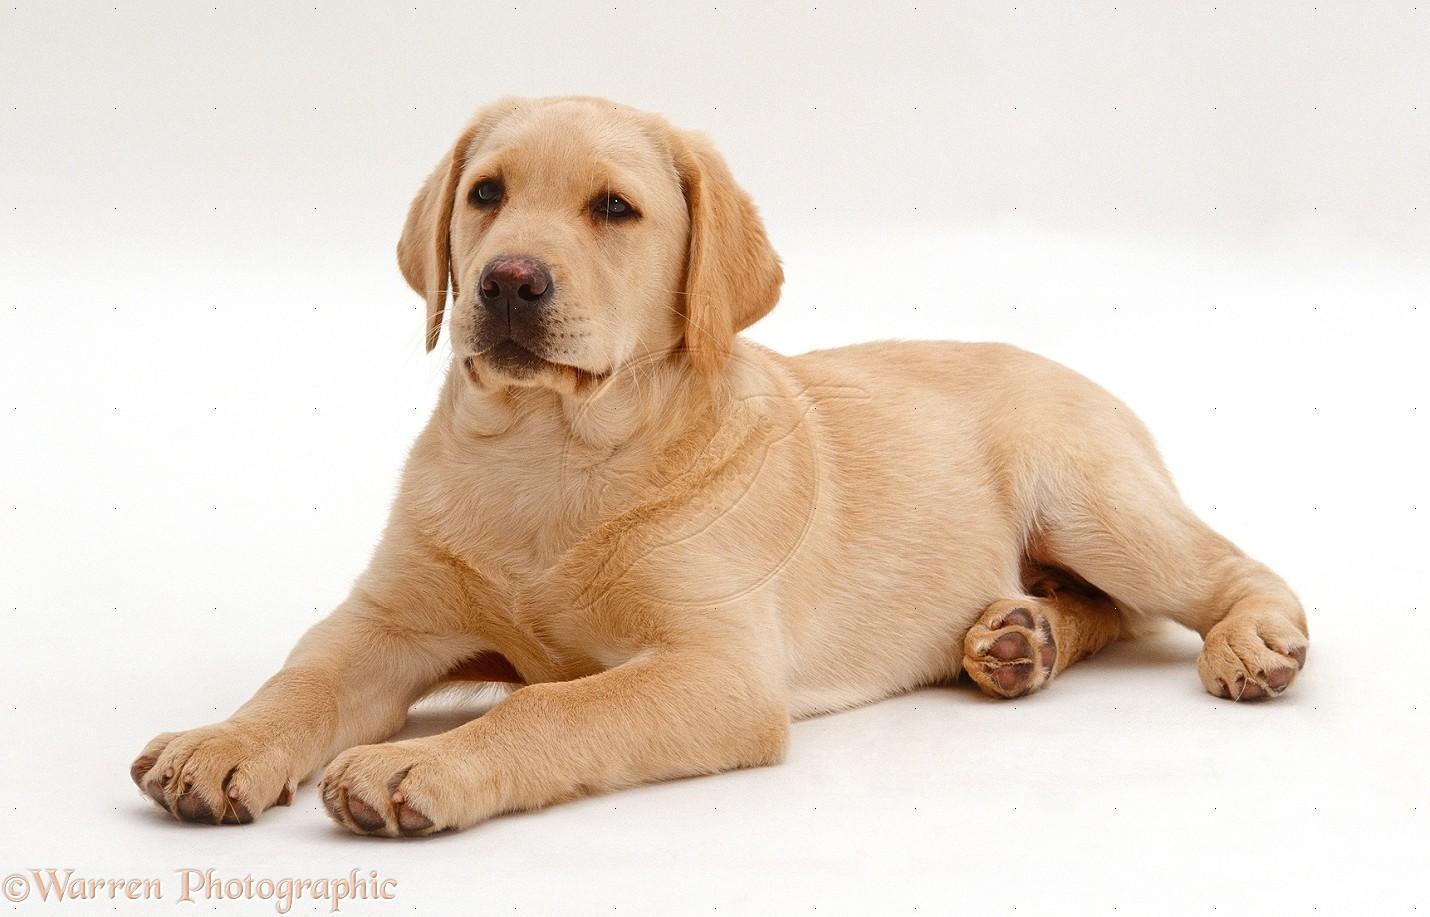 Labrador Husky Dog: Labrador Cool Labrador Dogs Breed